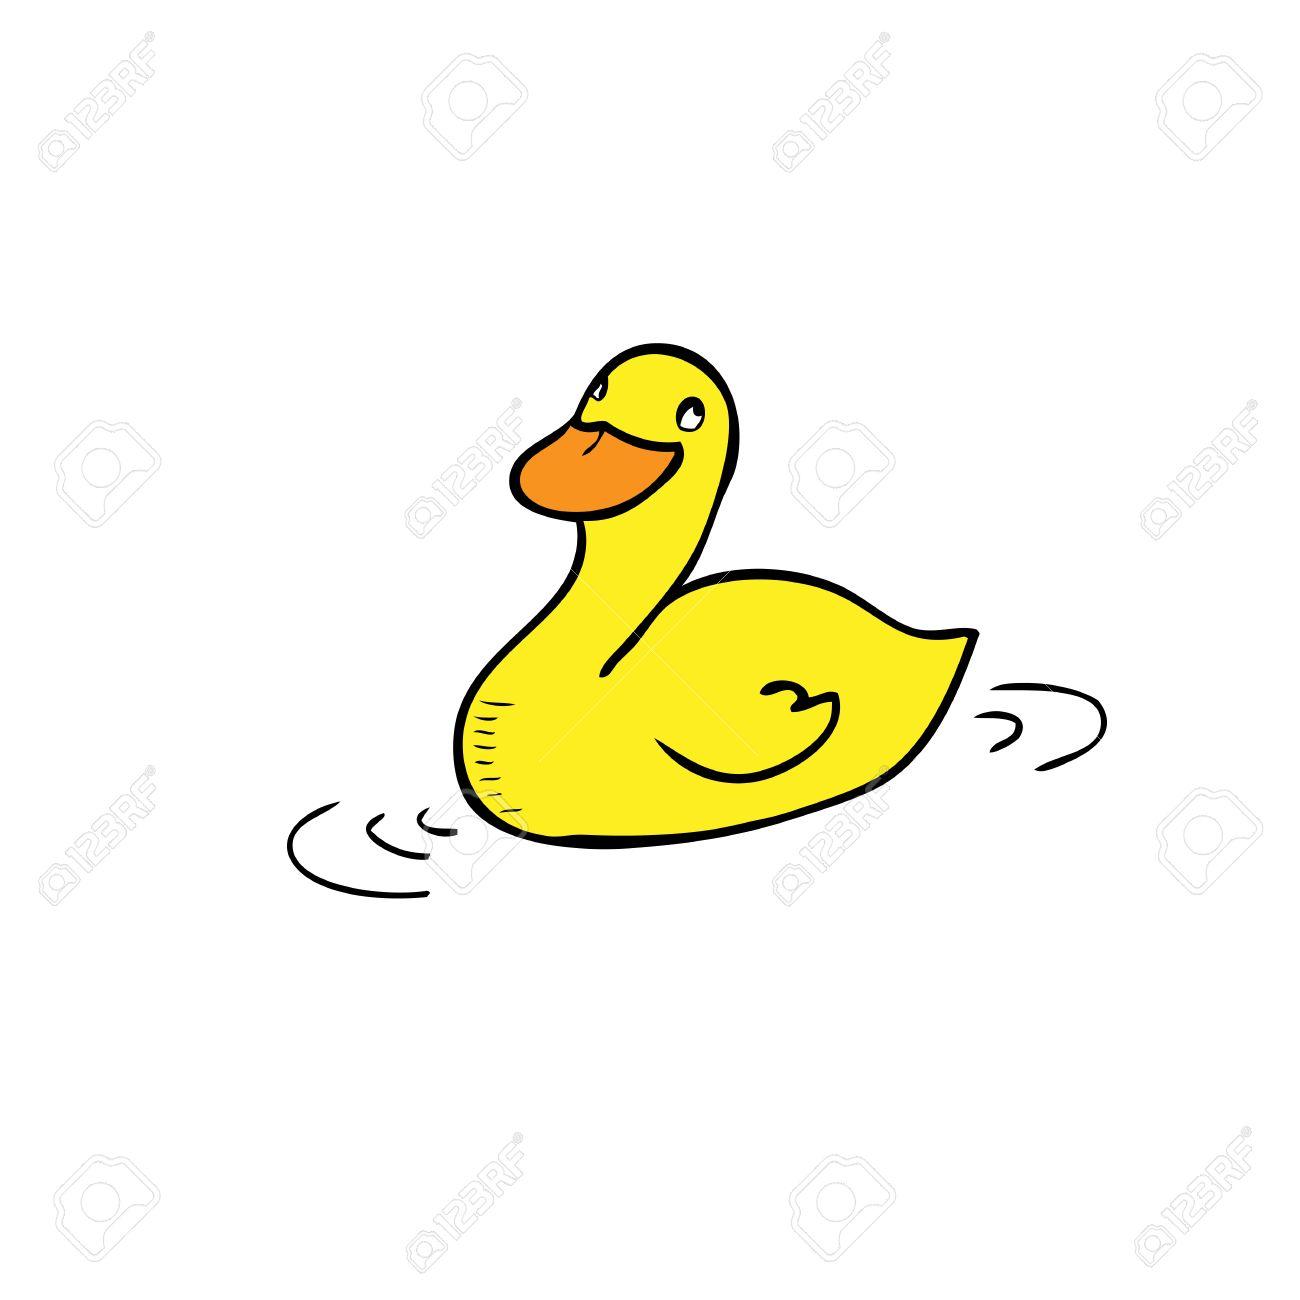 Duck Swimming Cartoon Drawing Vector Royalty Free Cliparts Vectors And Stock Illustration Image 31936959